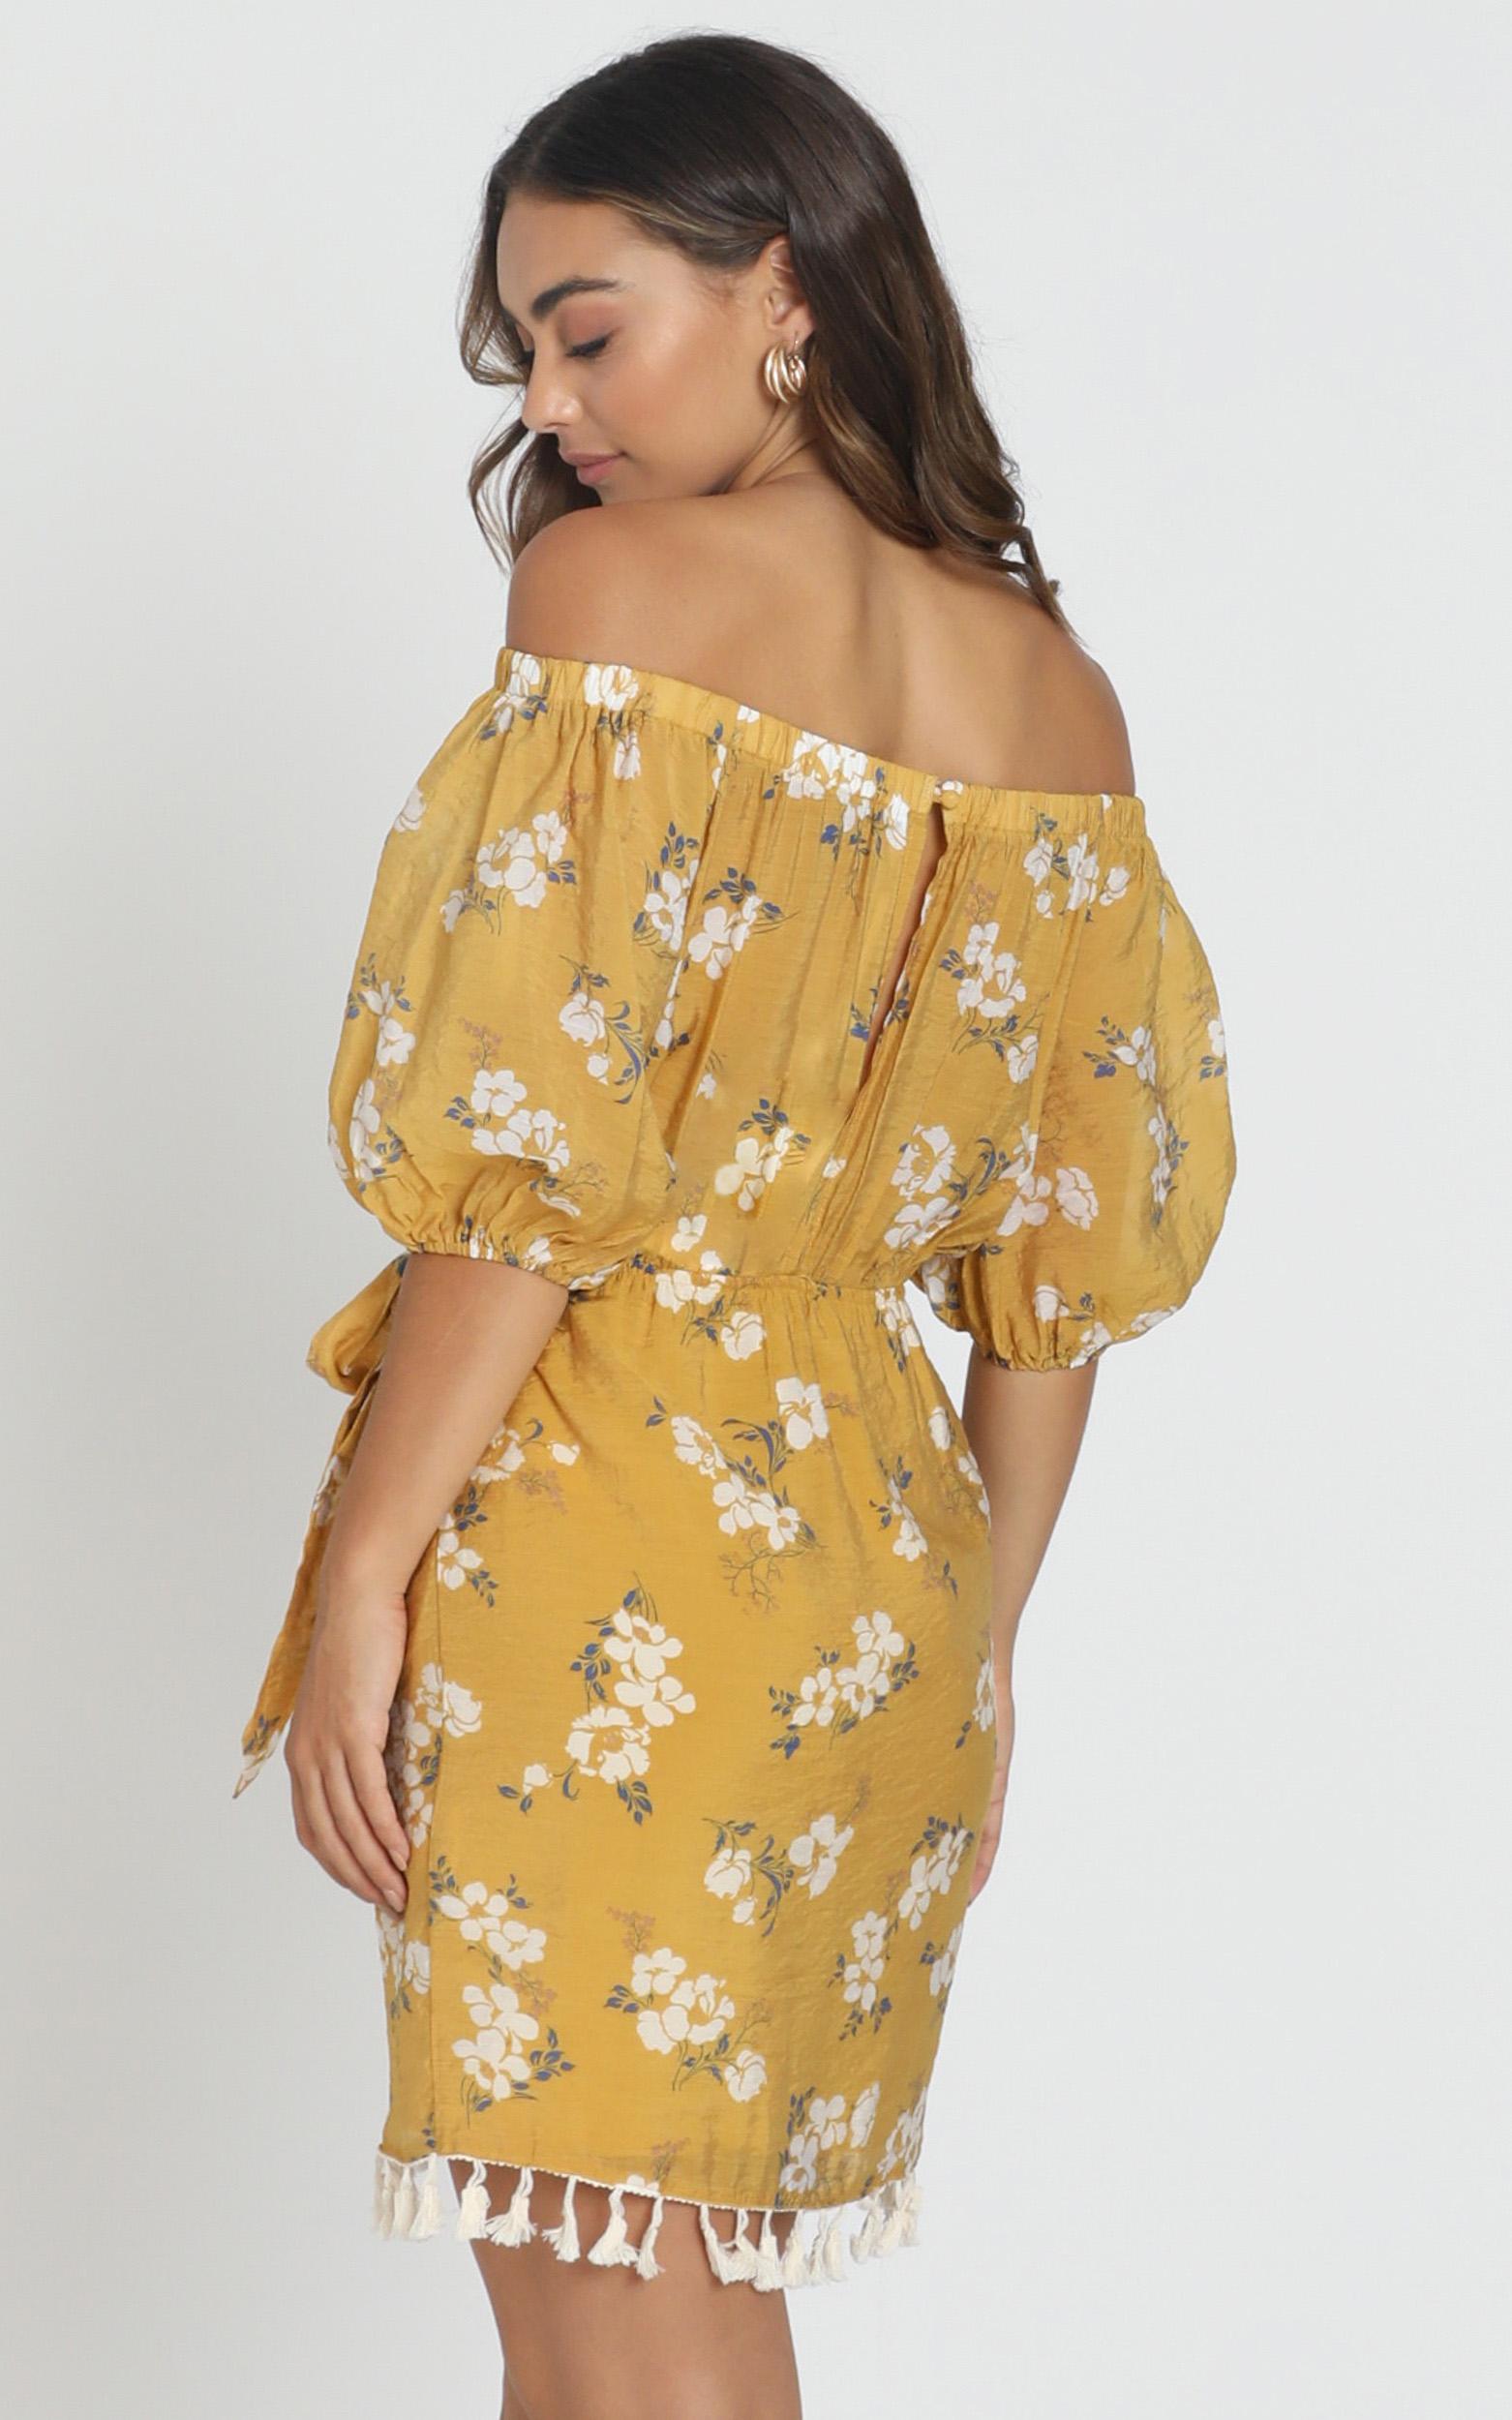 Ettie Bardot Dress in mustard floral - 6 (XS), Mustard, hi-res image number null